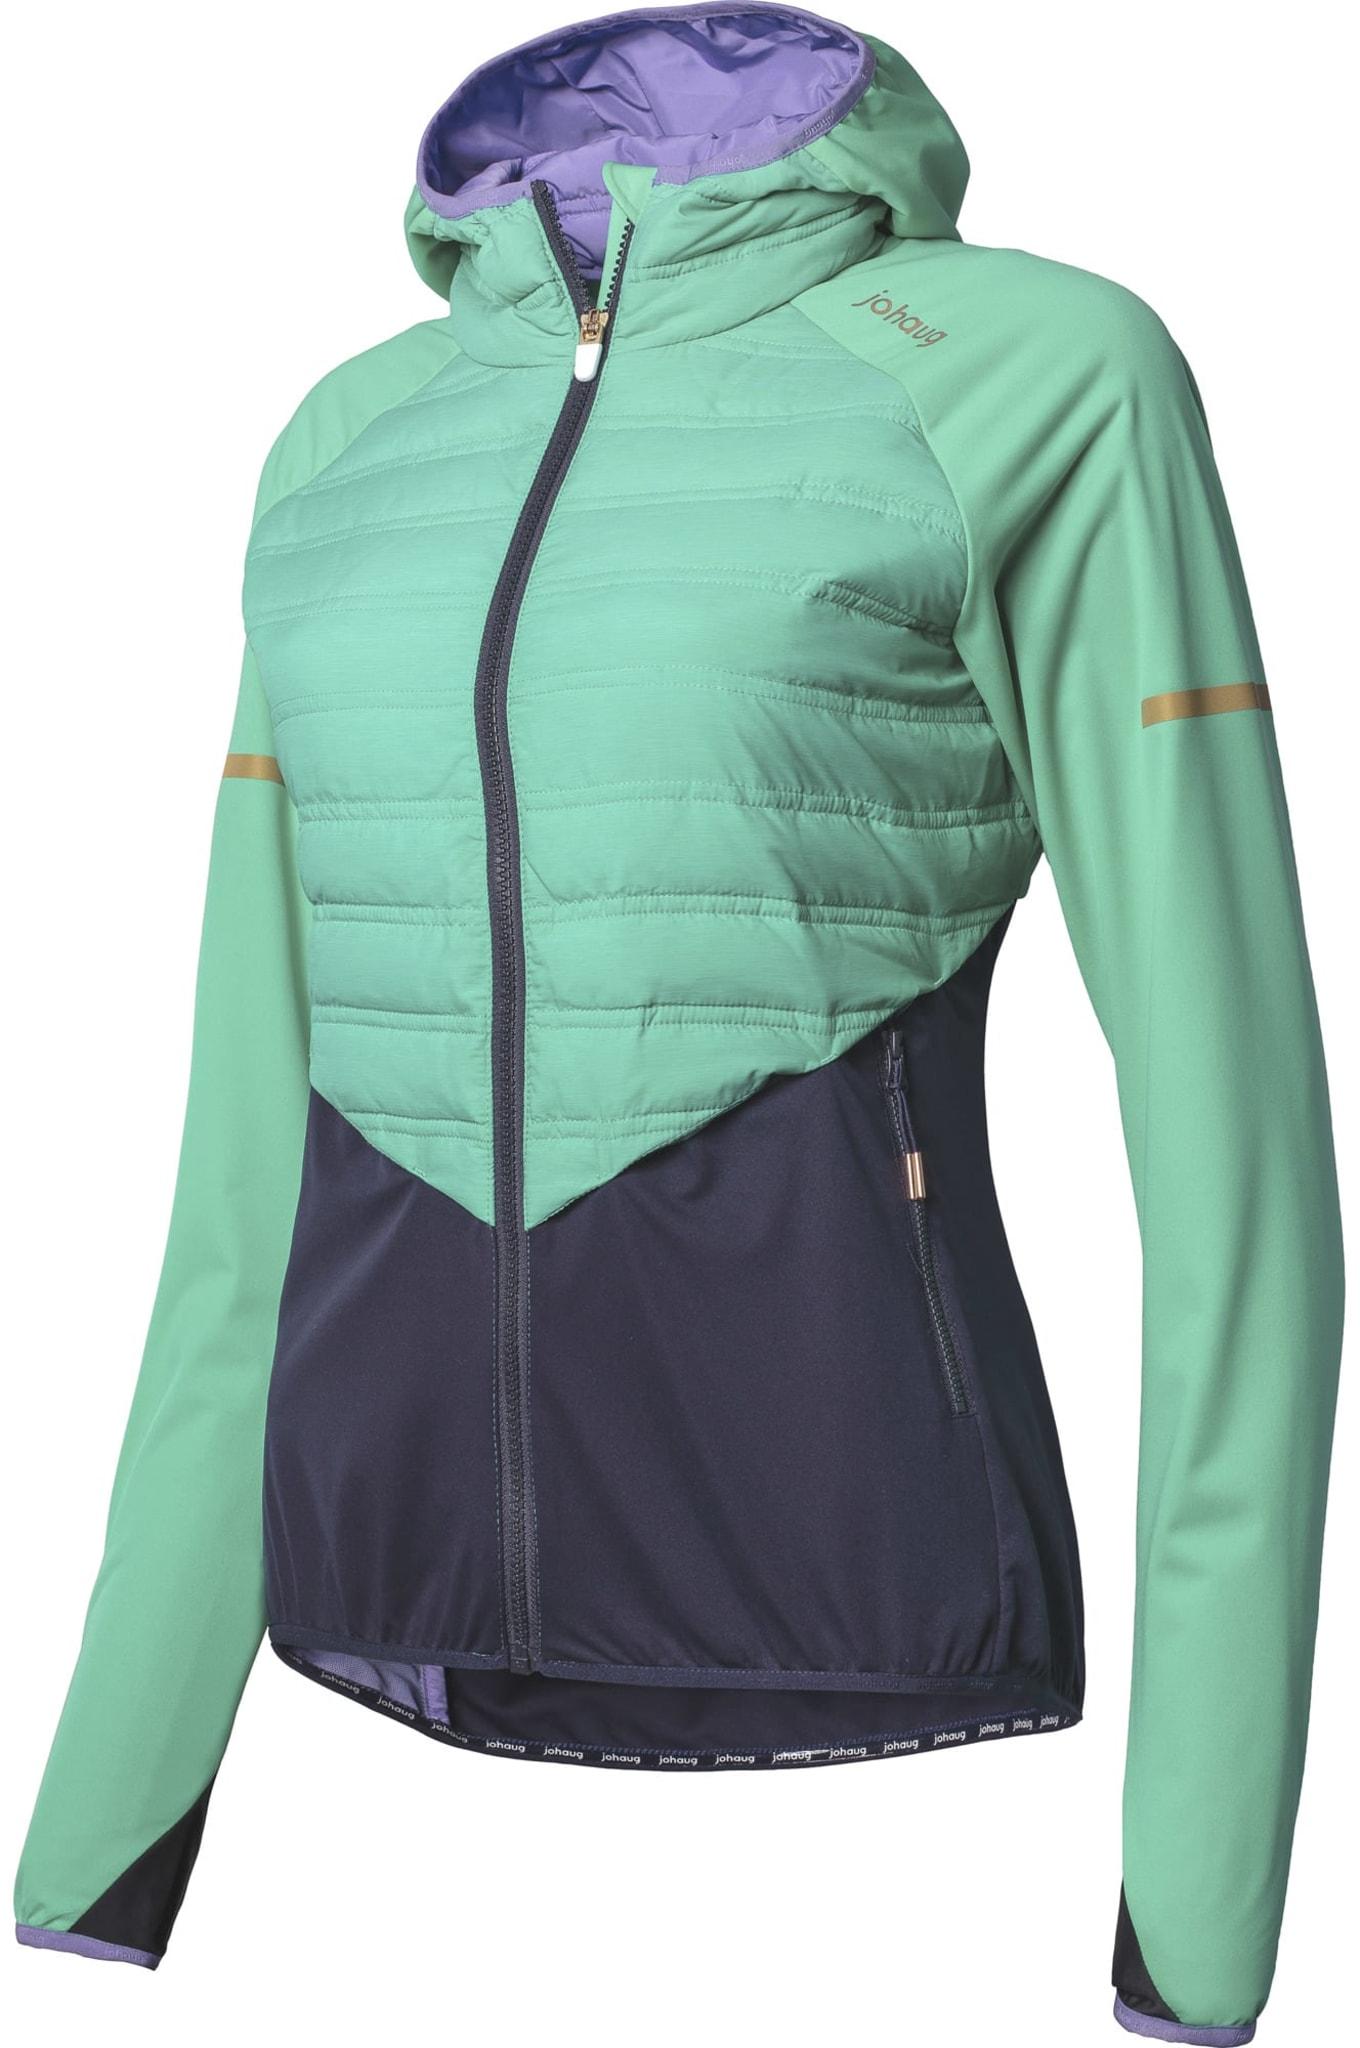 Concept Jacket